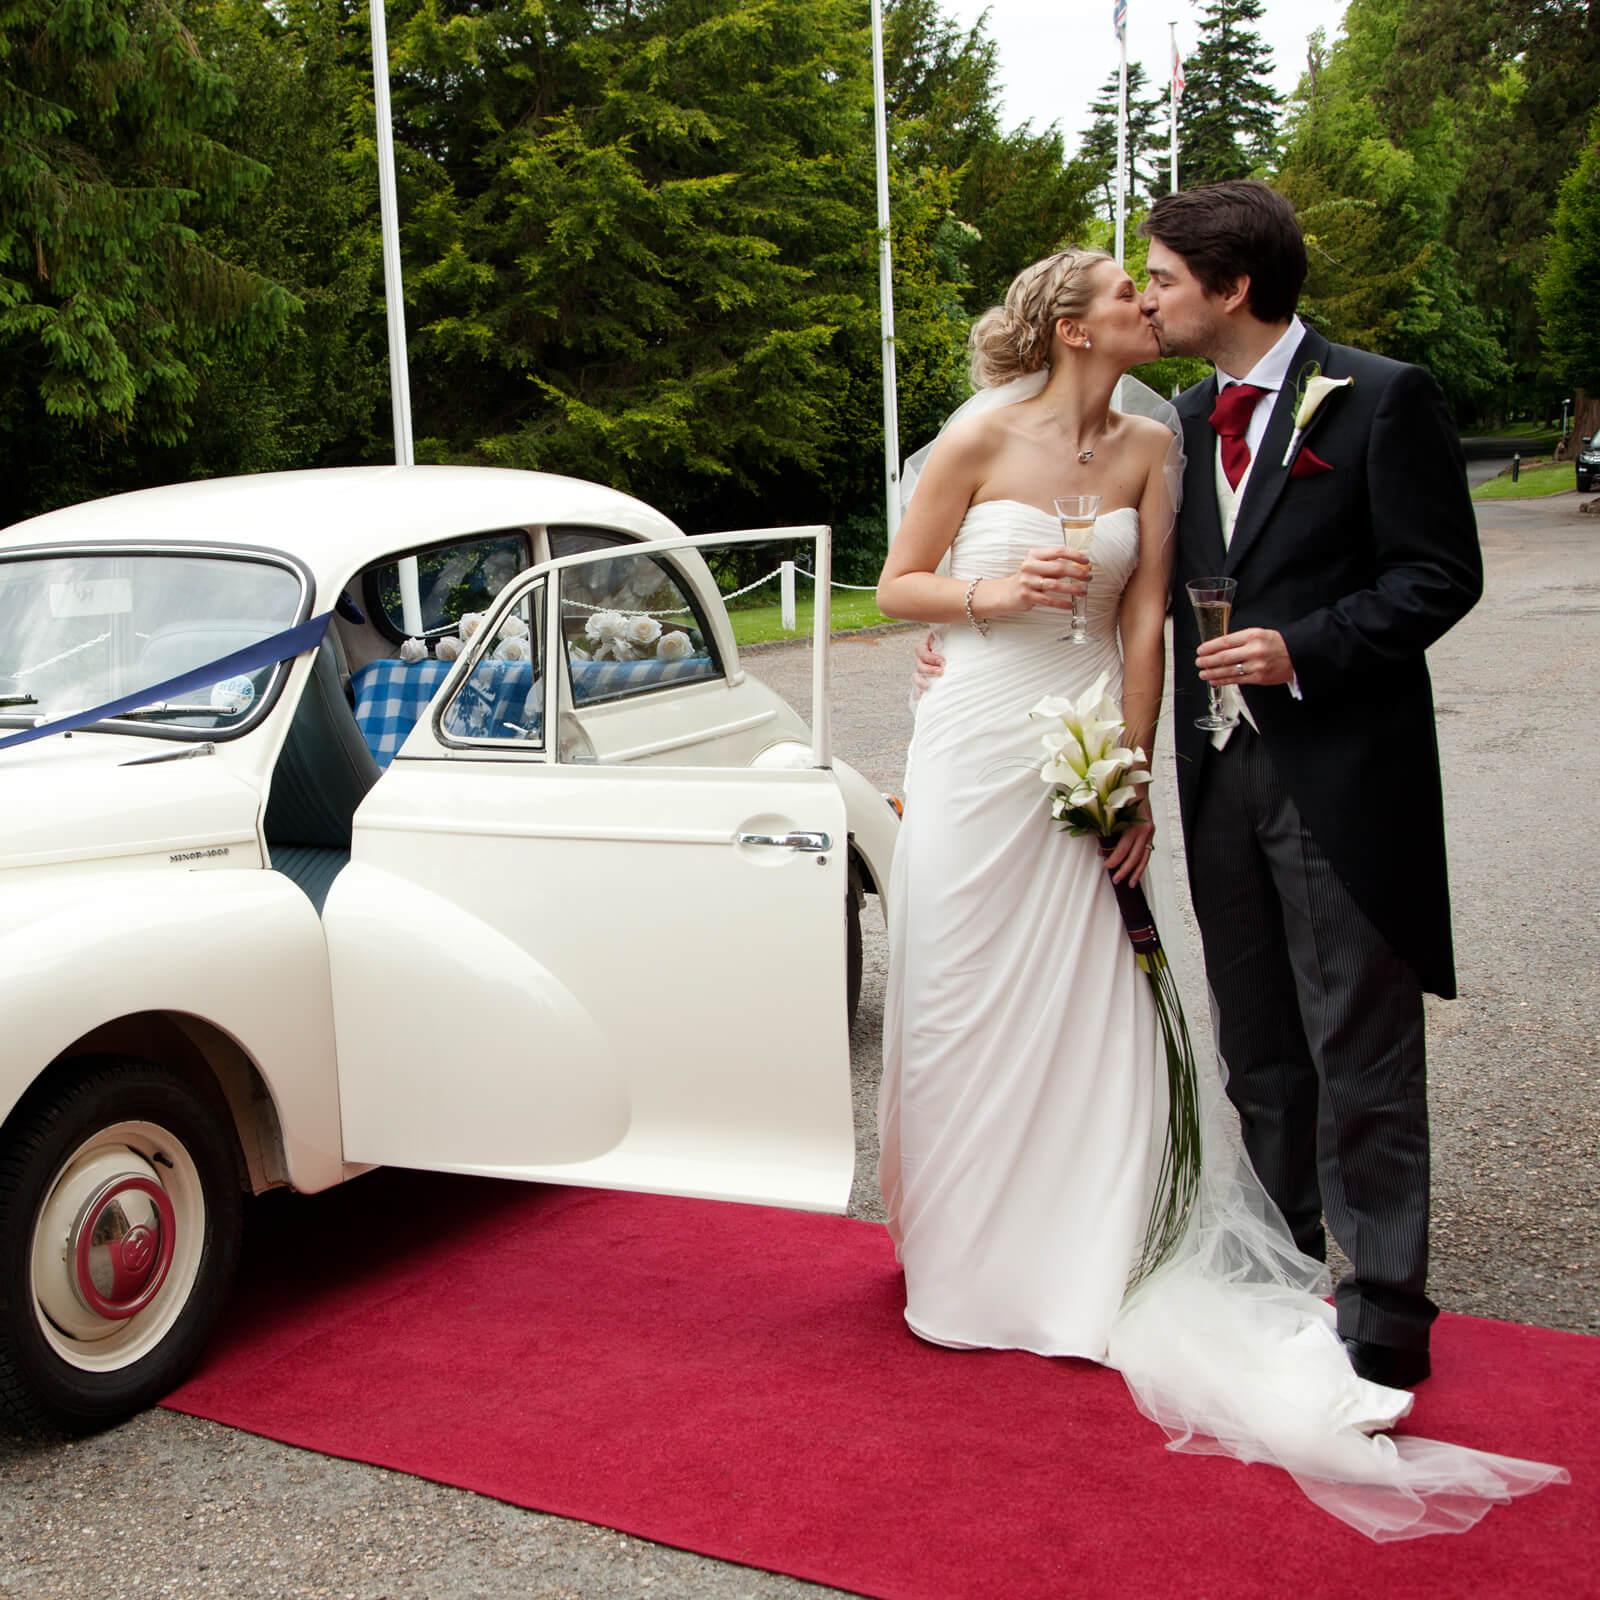 Warwickshire-wedding-photographer-Ettington-Park-hotel-2